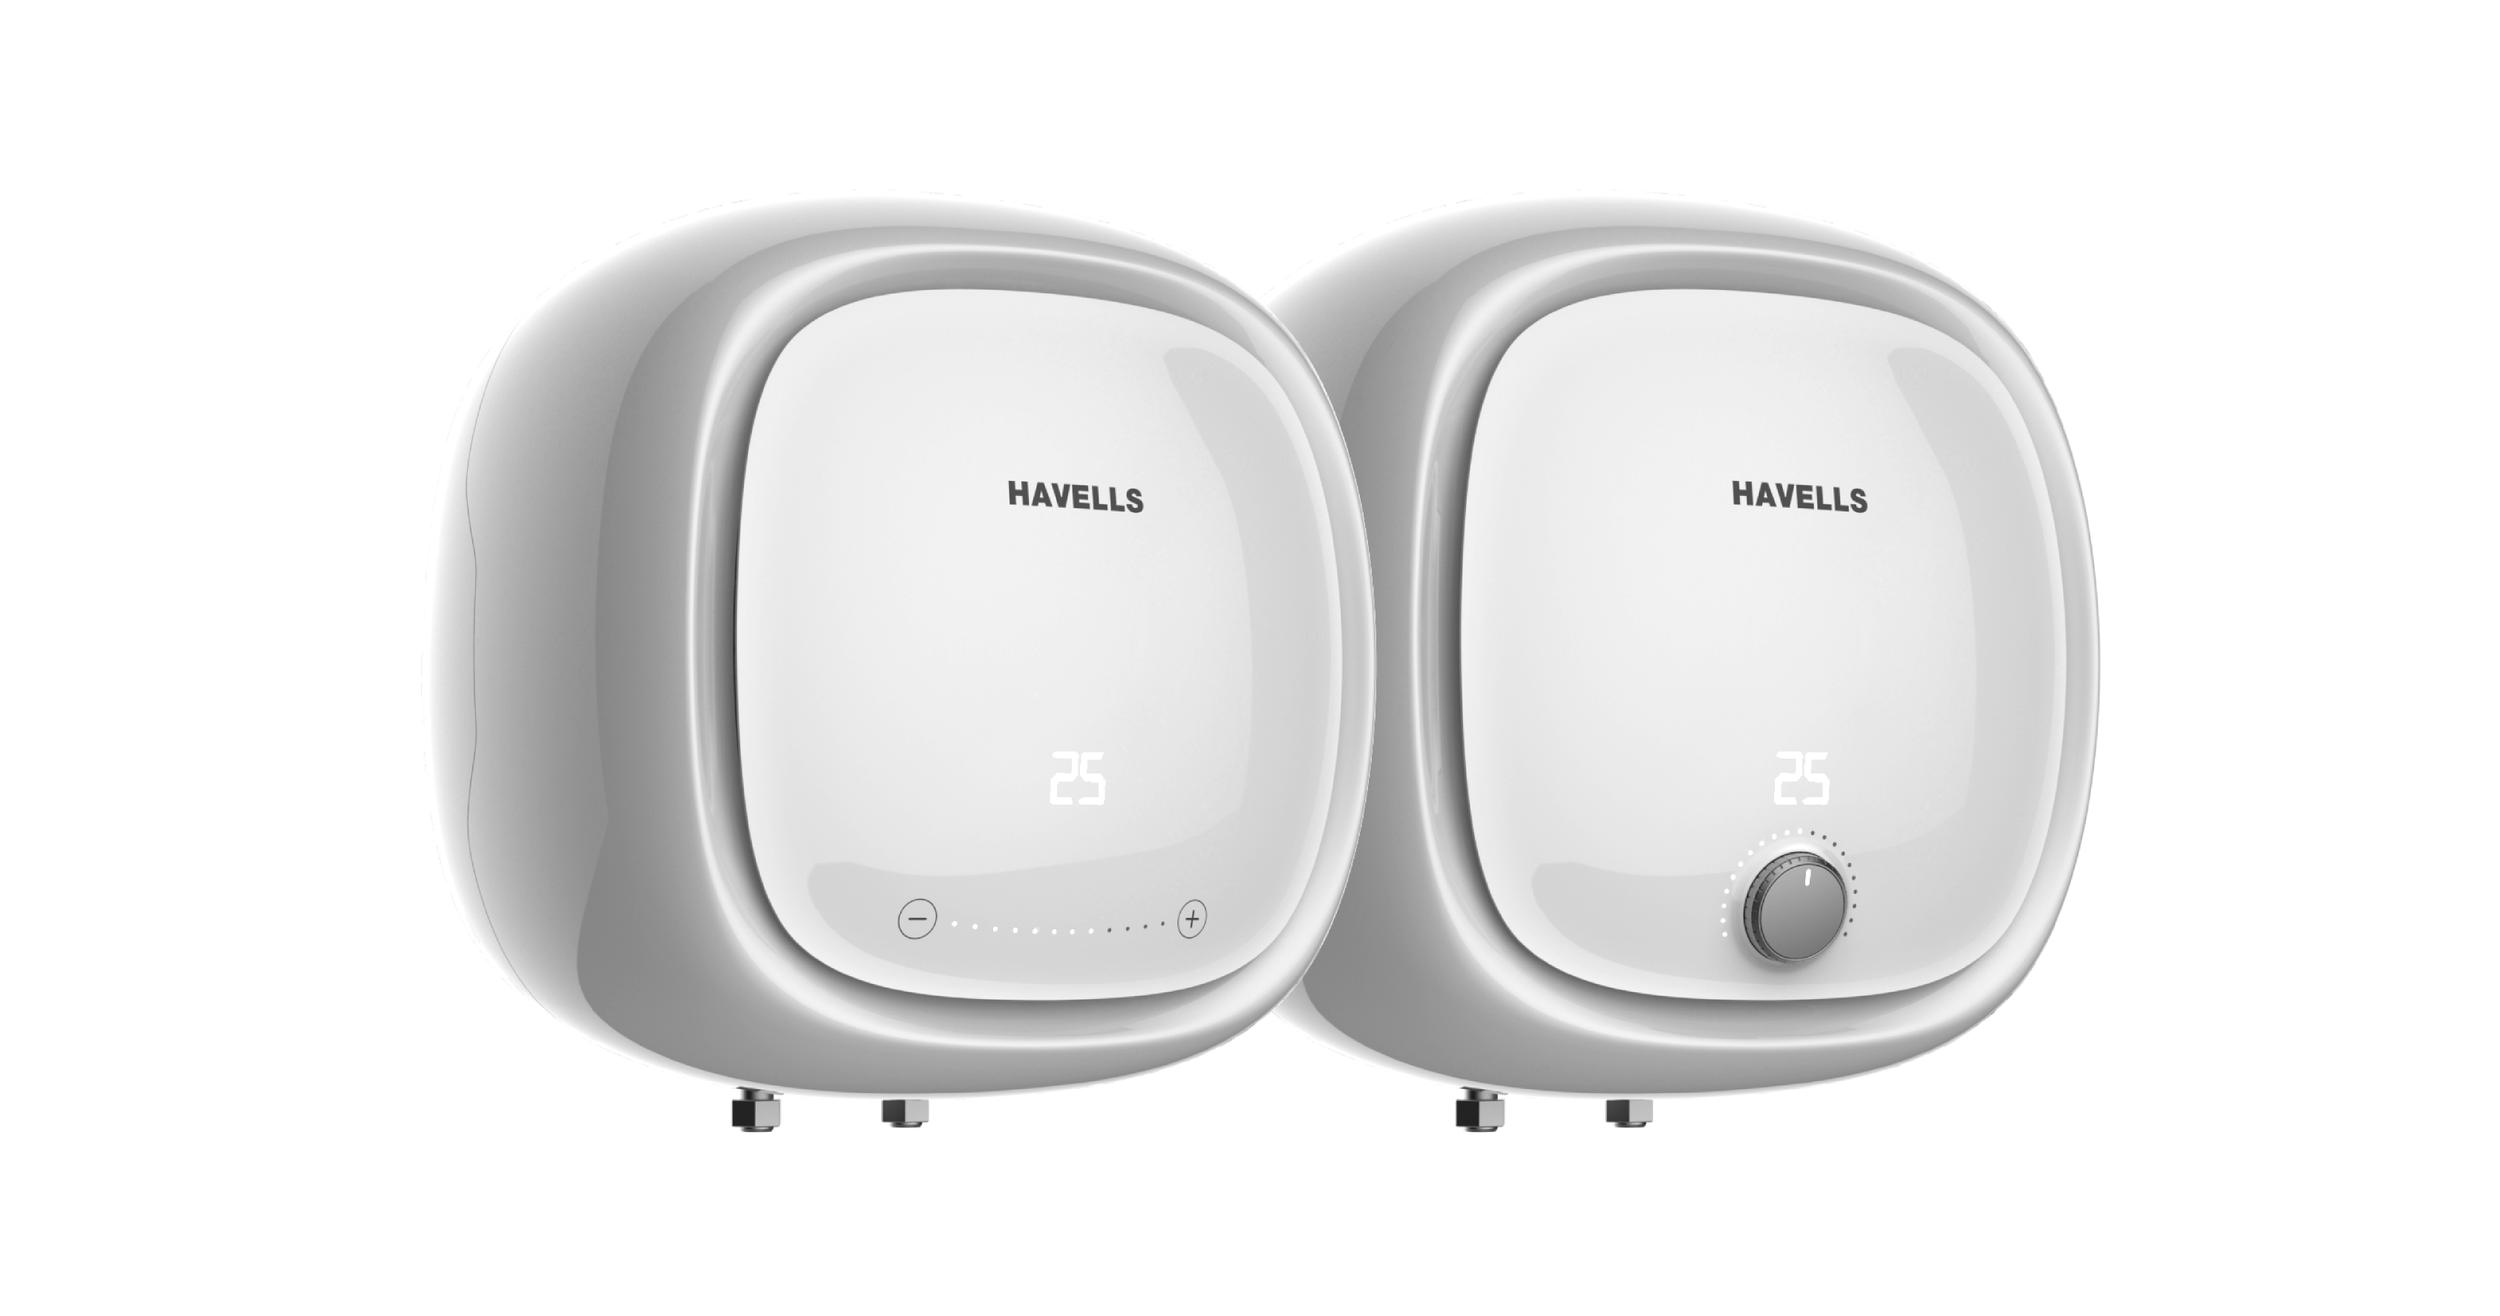 Adonia water heater - Digital and Manual controls